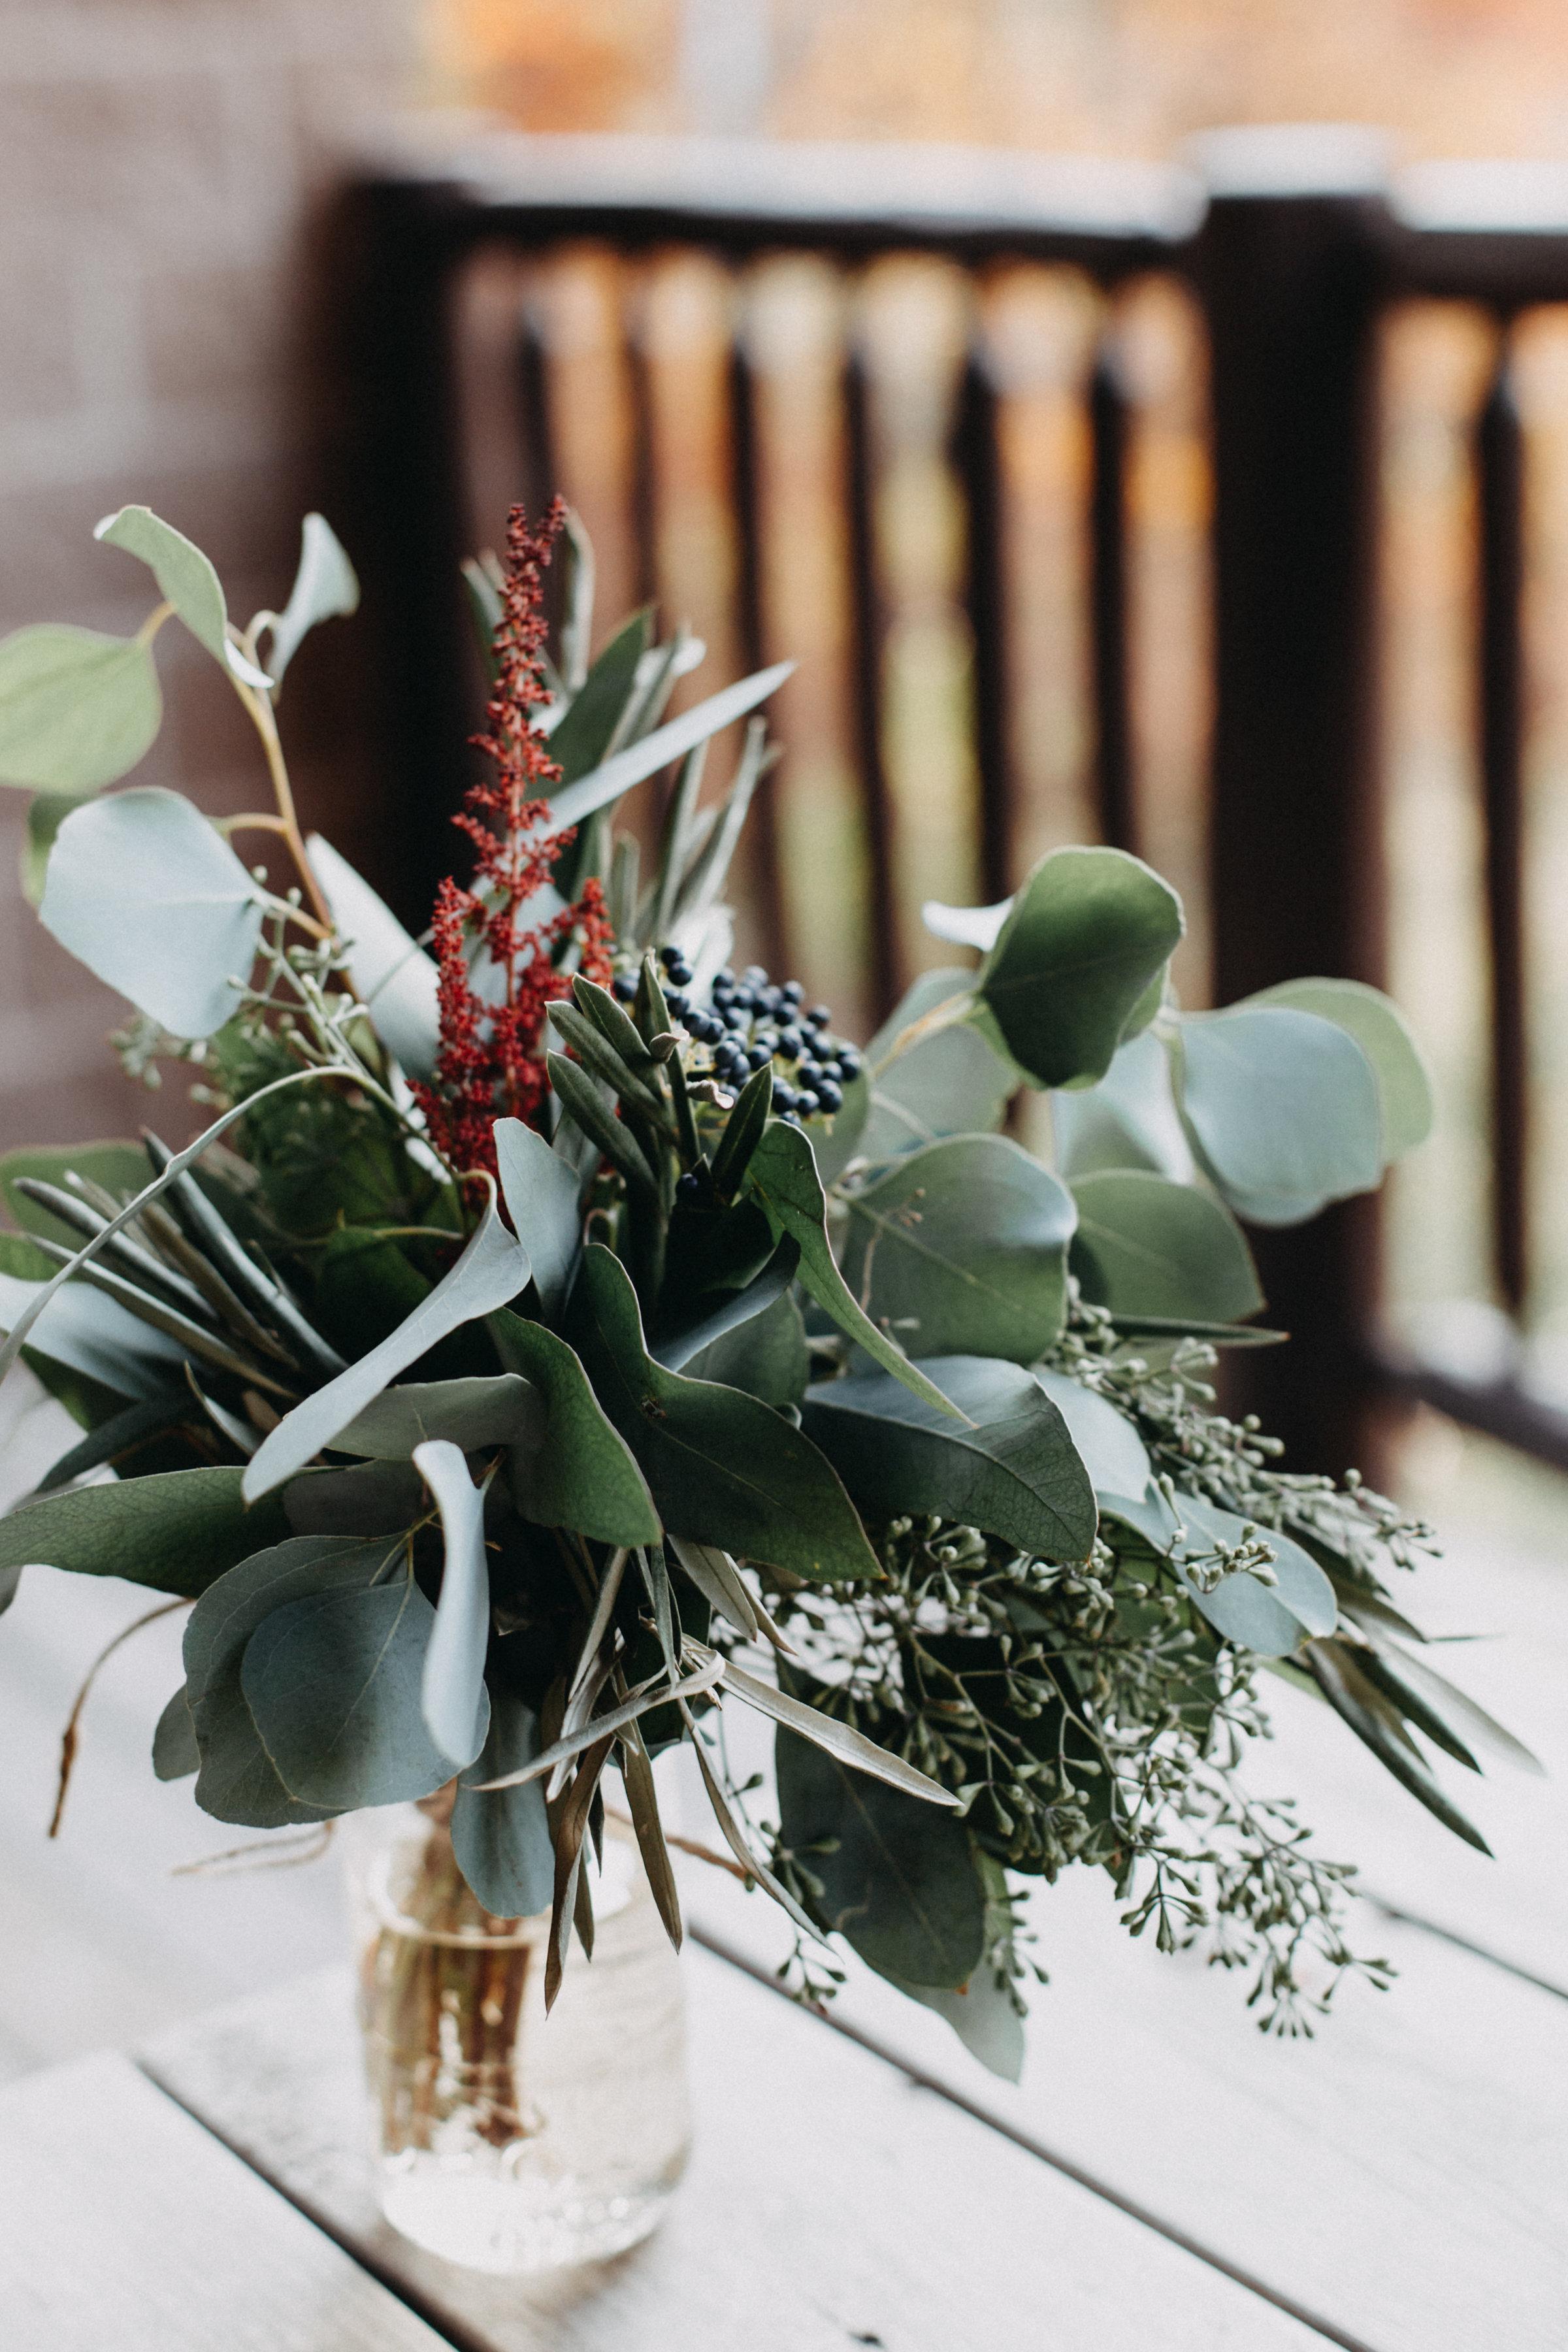 Fern and floret botanical mn fern + floret minnesota wedding florist floral design mn minneapolis mpls st paul sharayah krautkremer britt dezeeuw photography northland arboretum